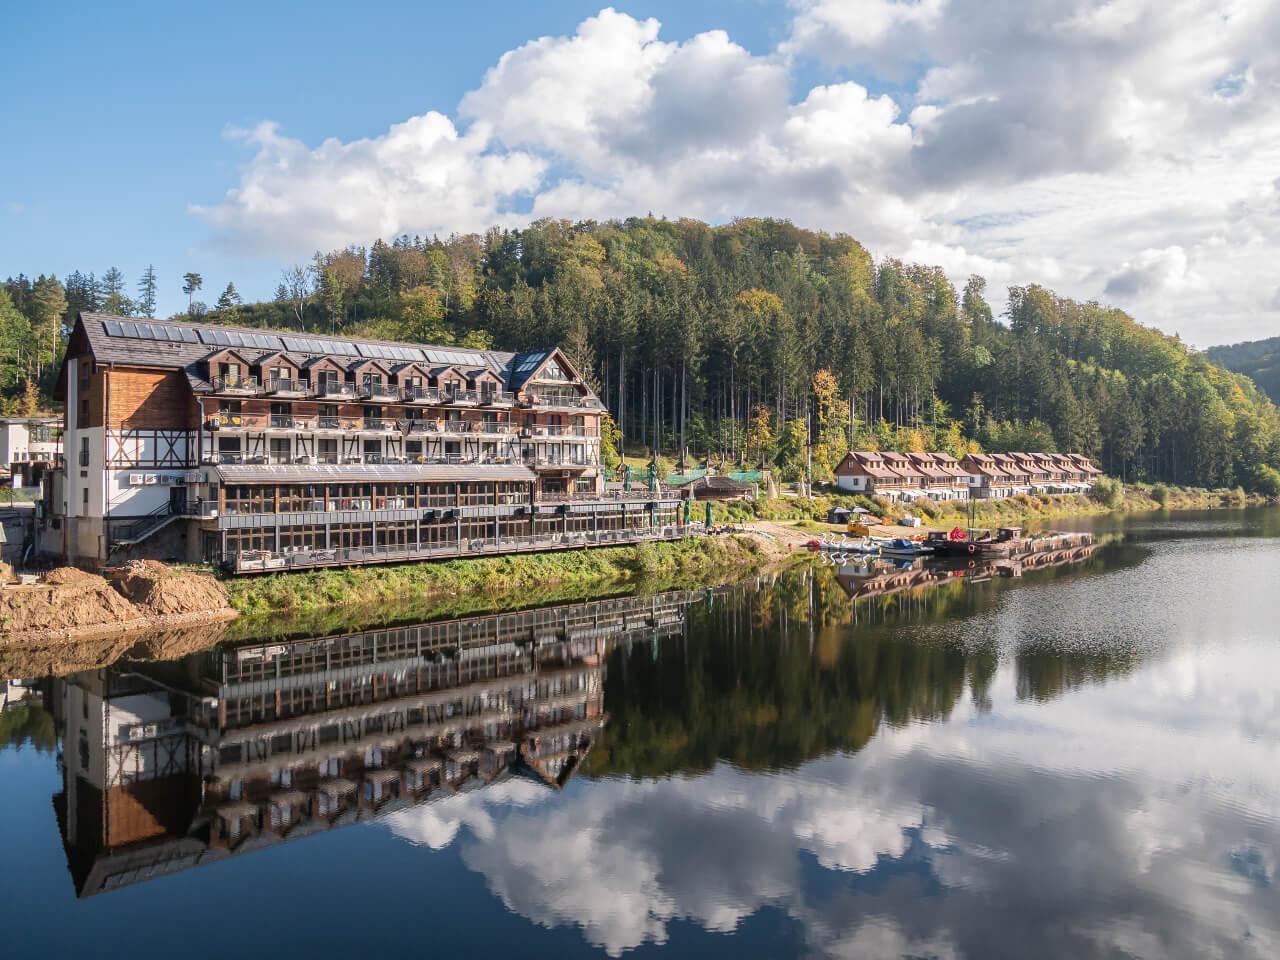 Hotel Maria Antonina Jezioro Bystrzyckie